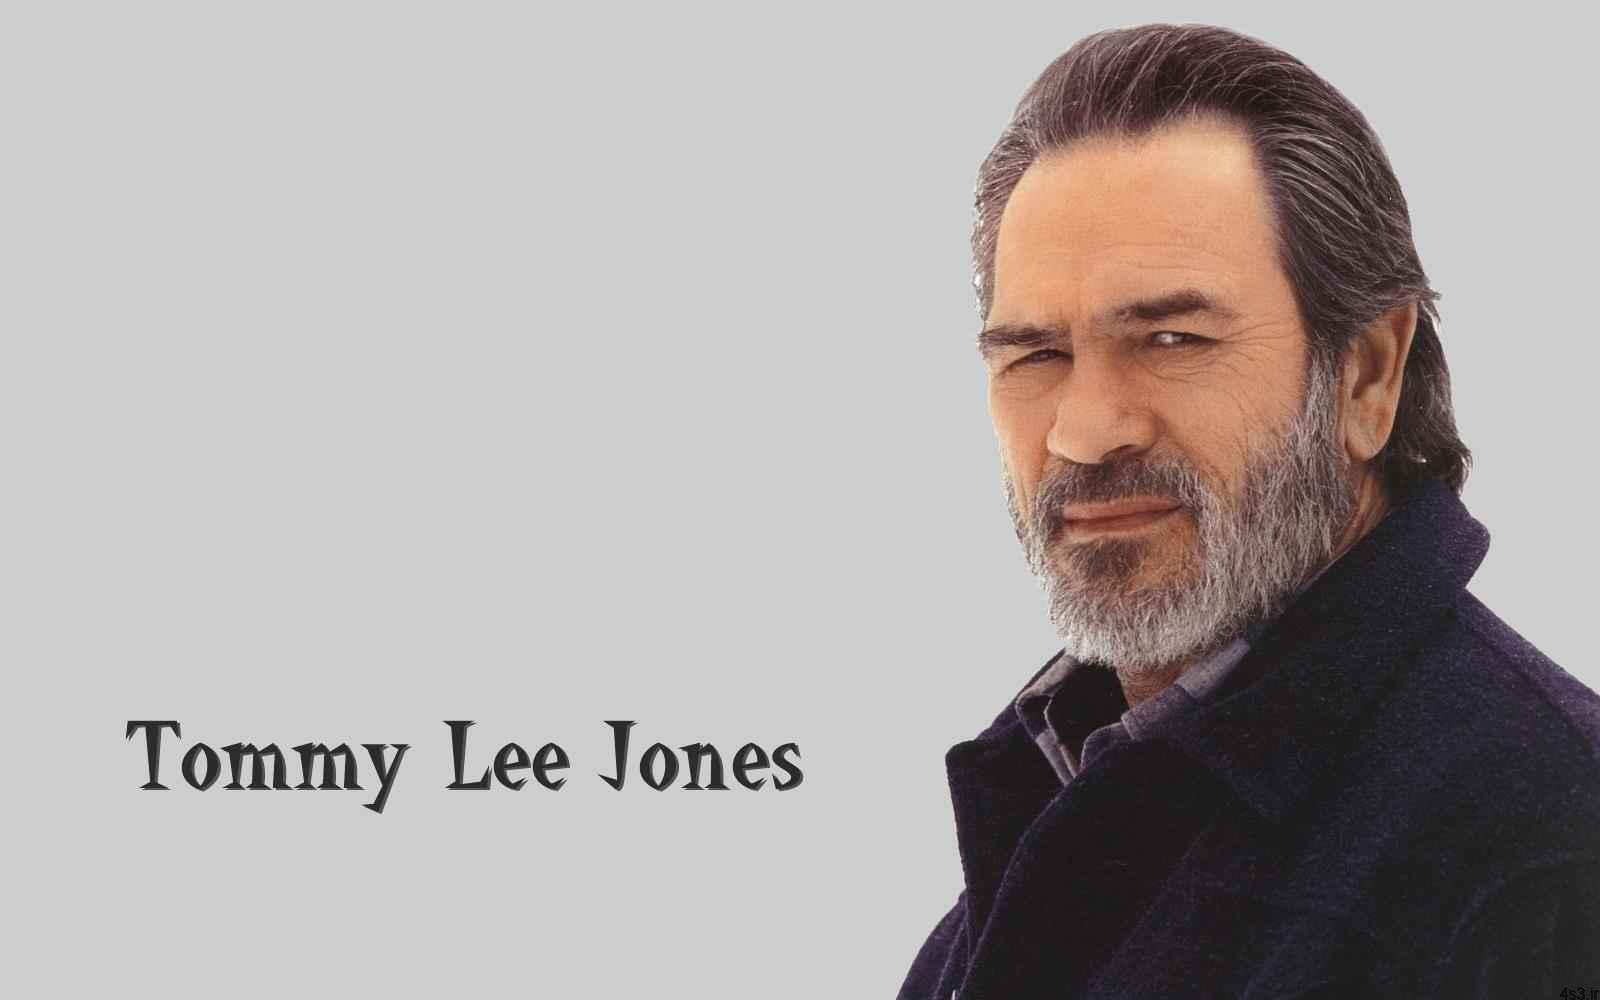 Tommy Lee Jones Wallpapers Part 1 | تصاویر تامی لی جونز بخش ۱